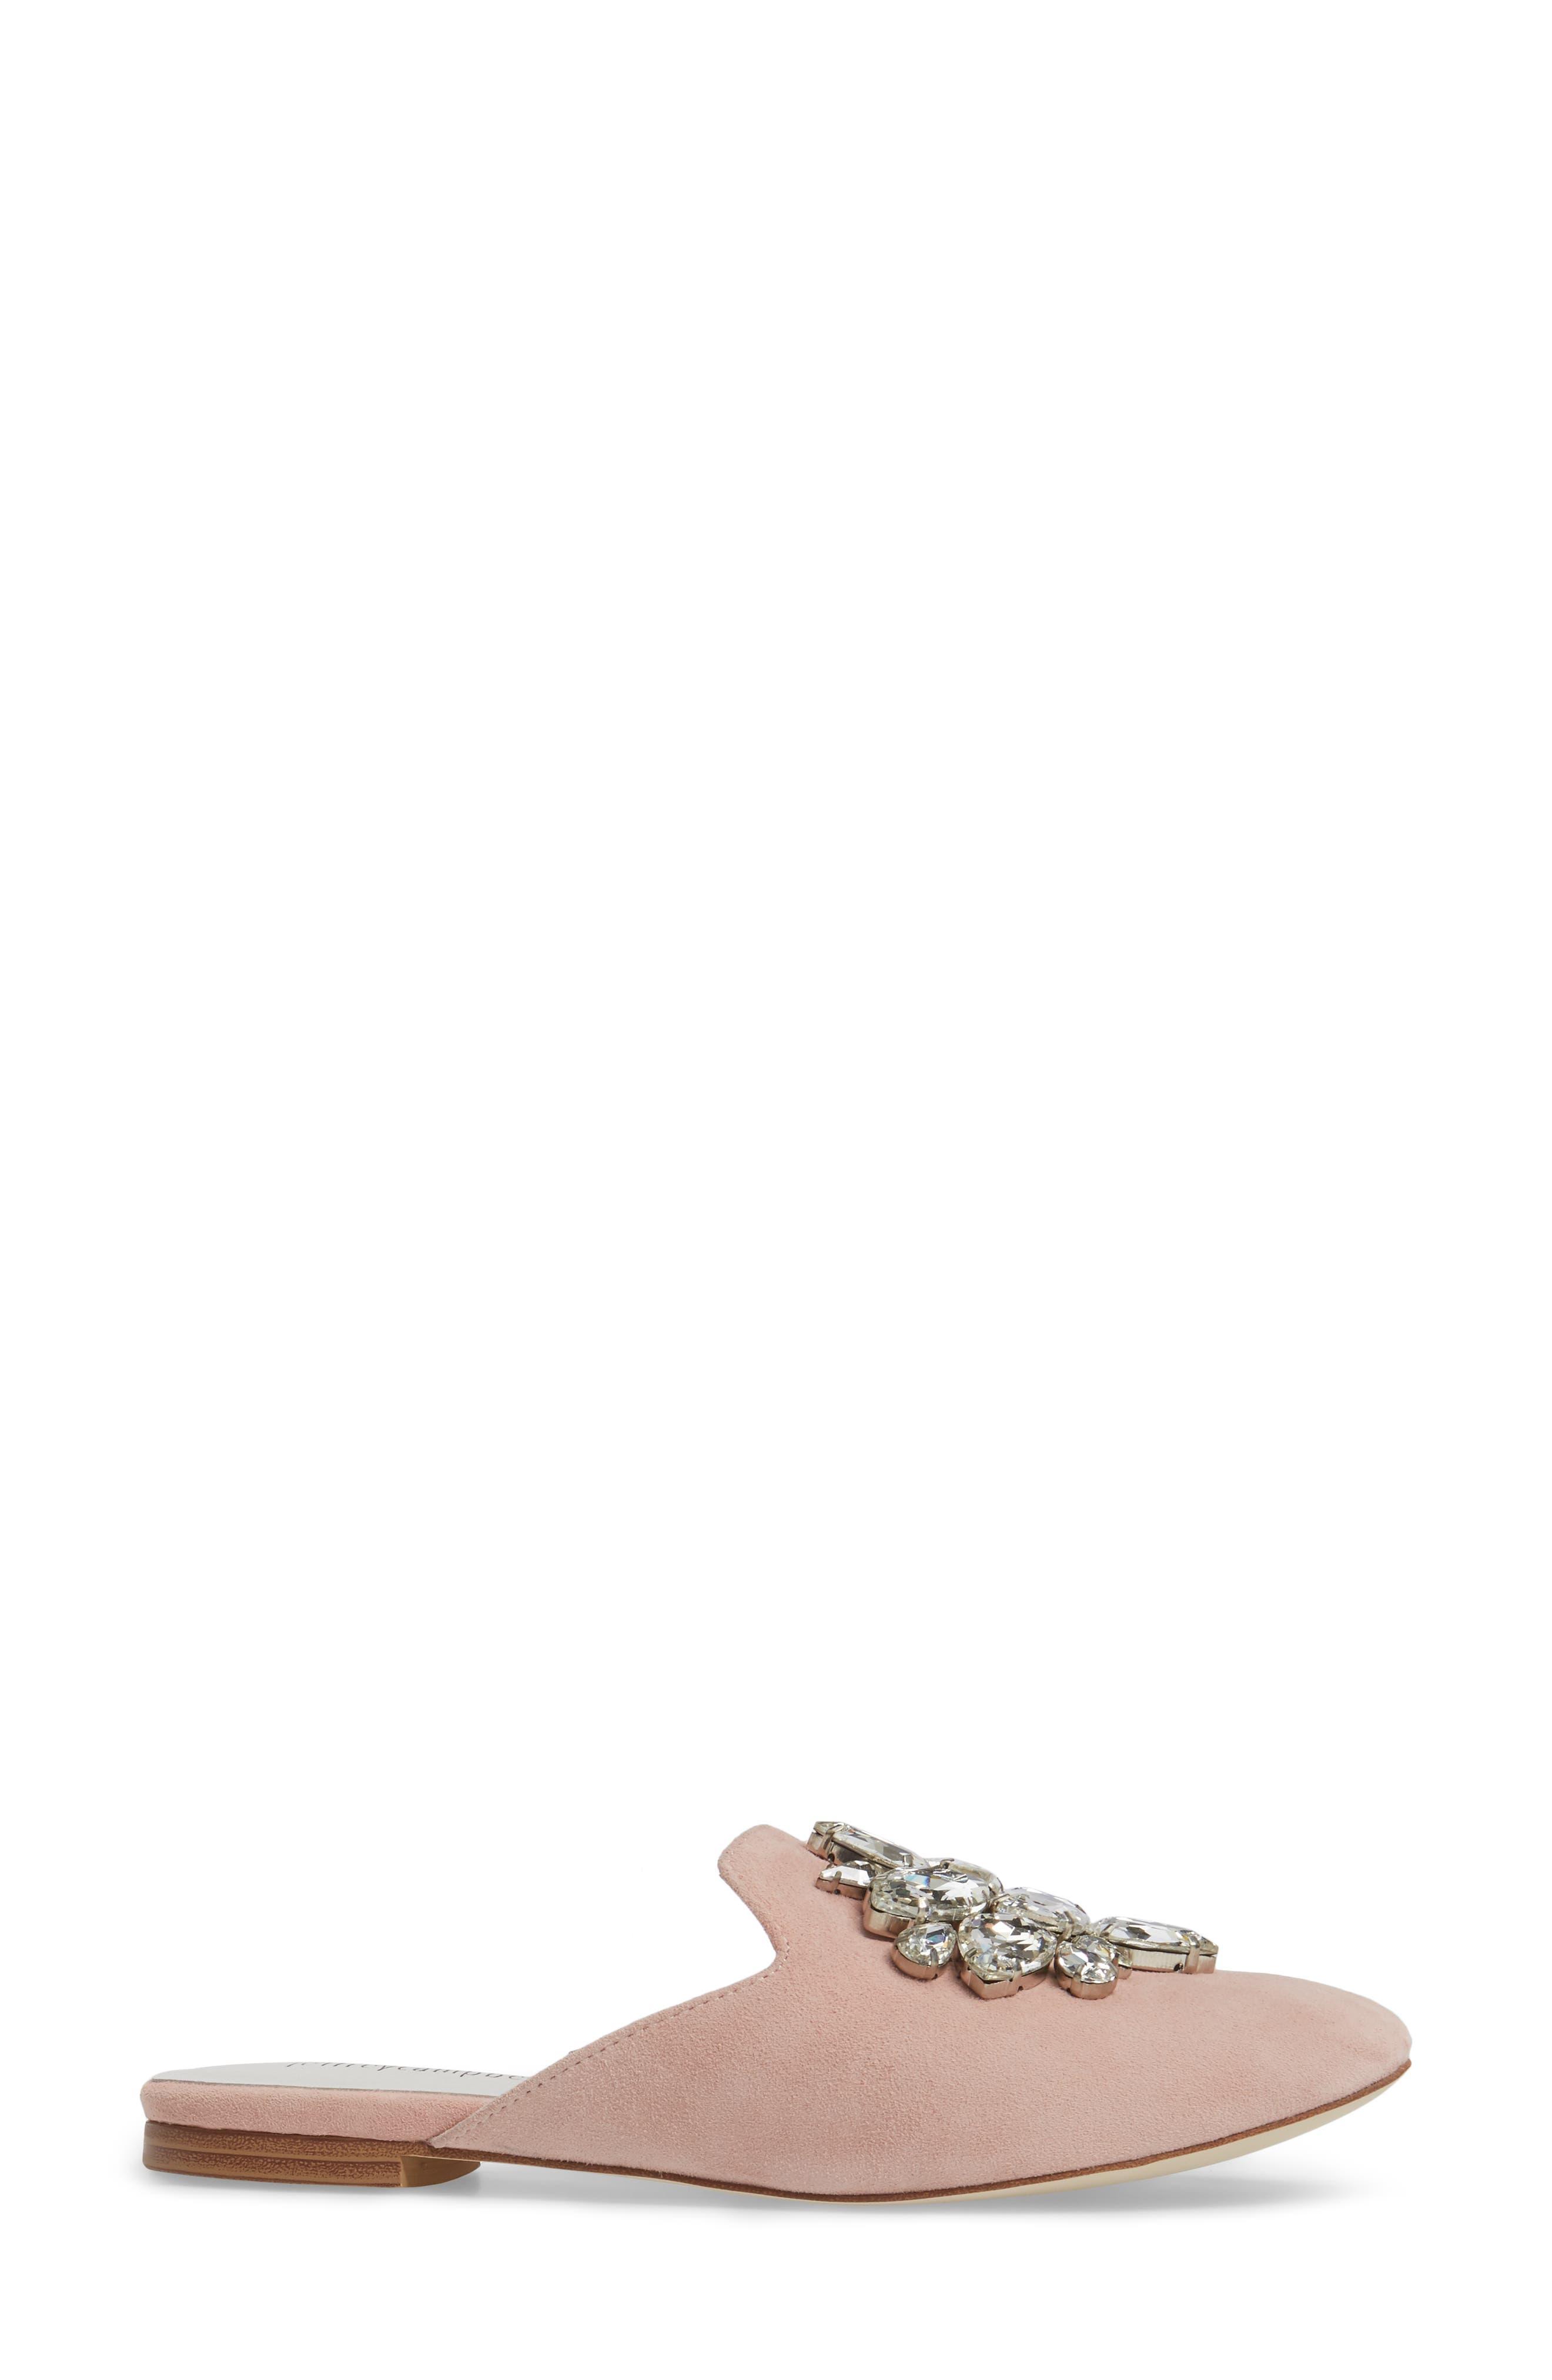 Alternate Image 3  - Jeffrey Campbell Ravis Crystal Embellished Mule (Women)